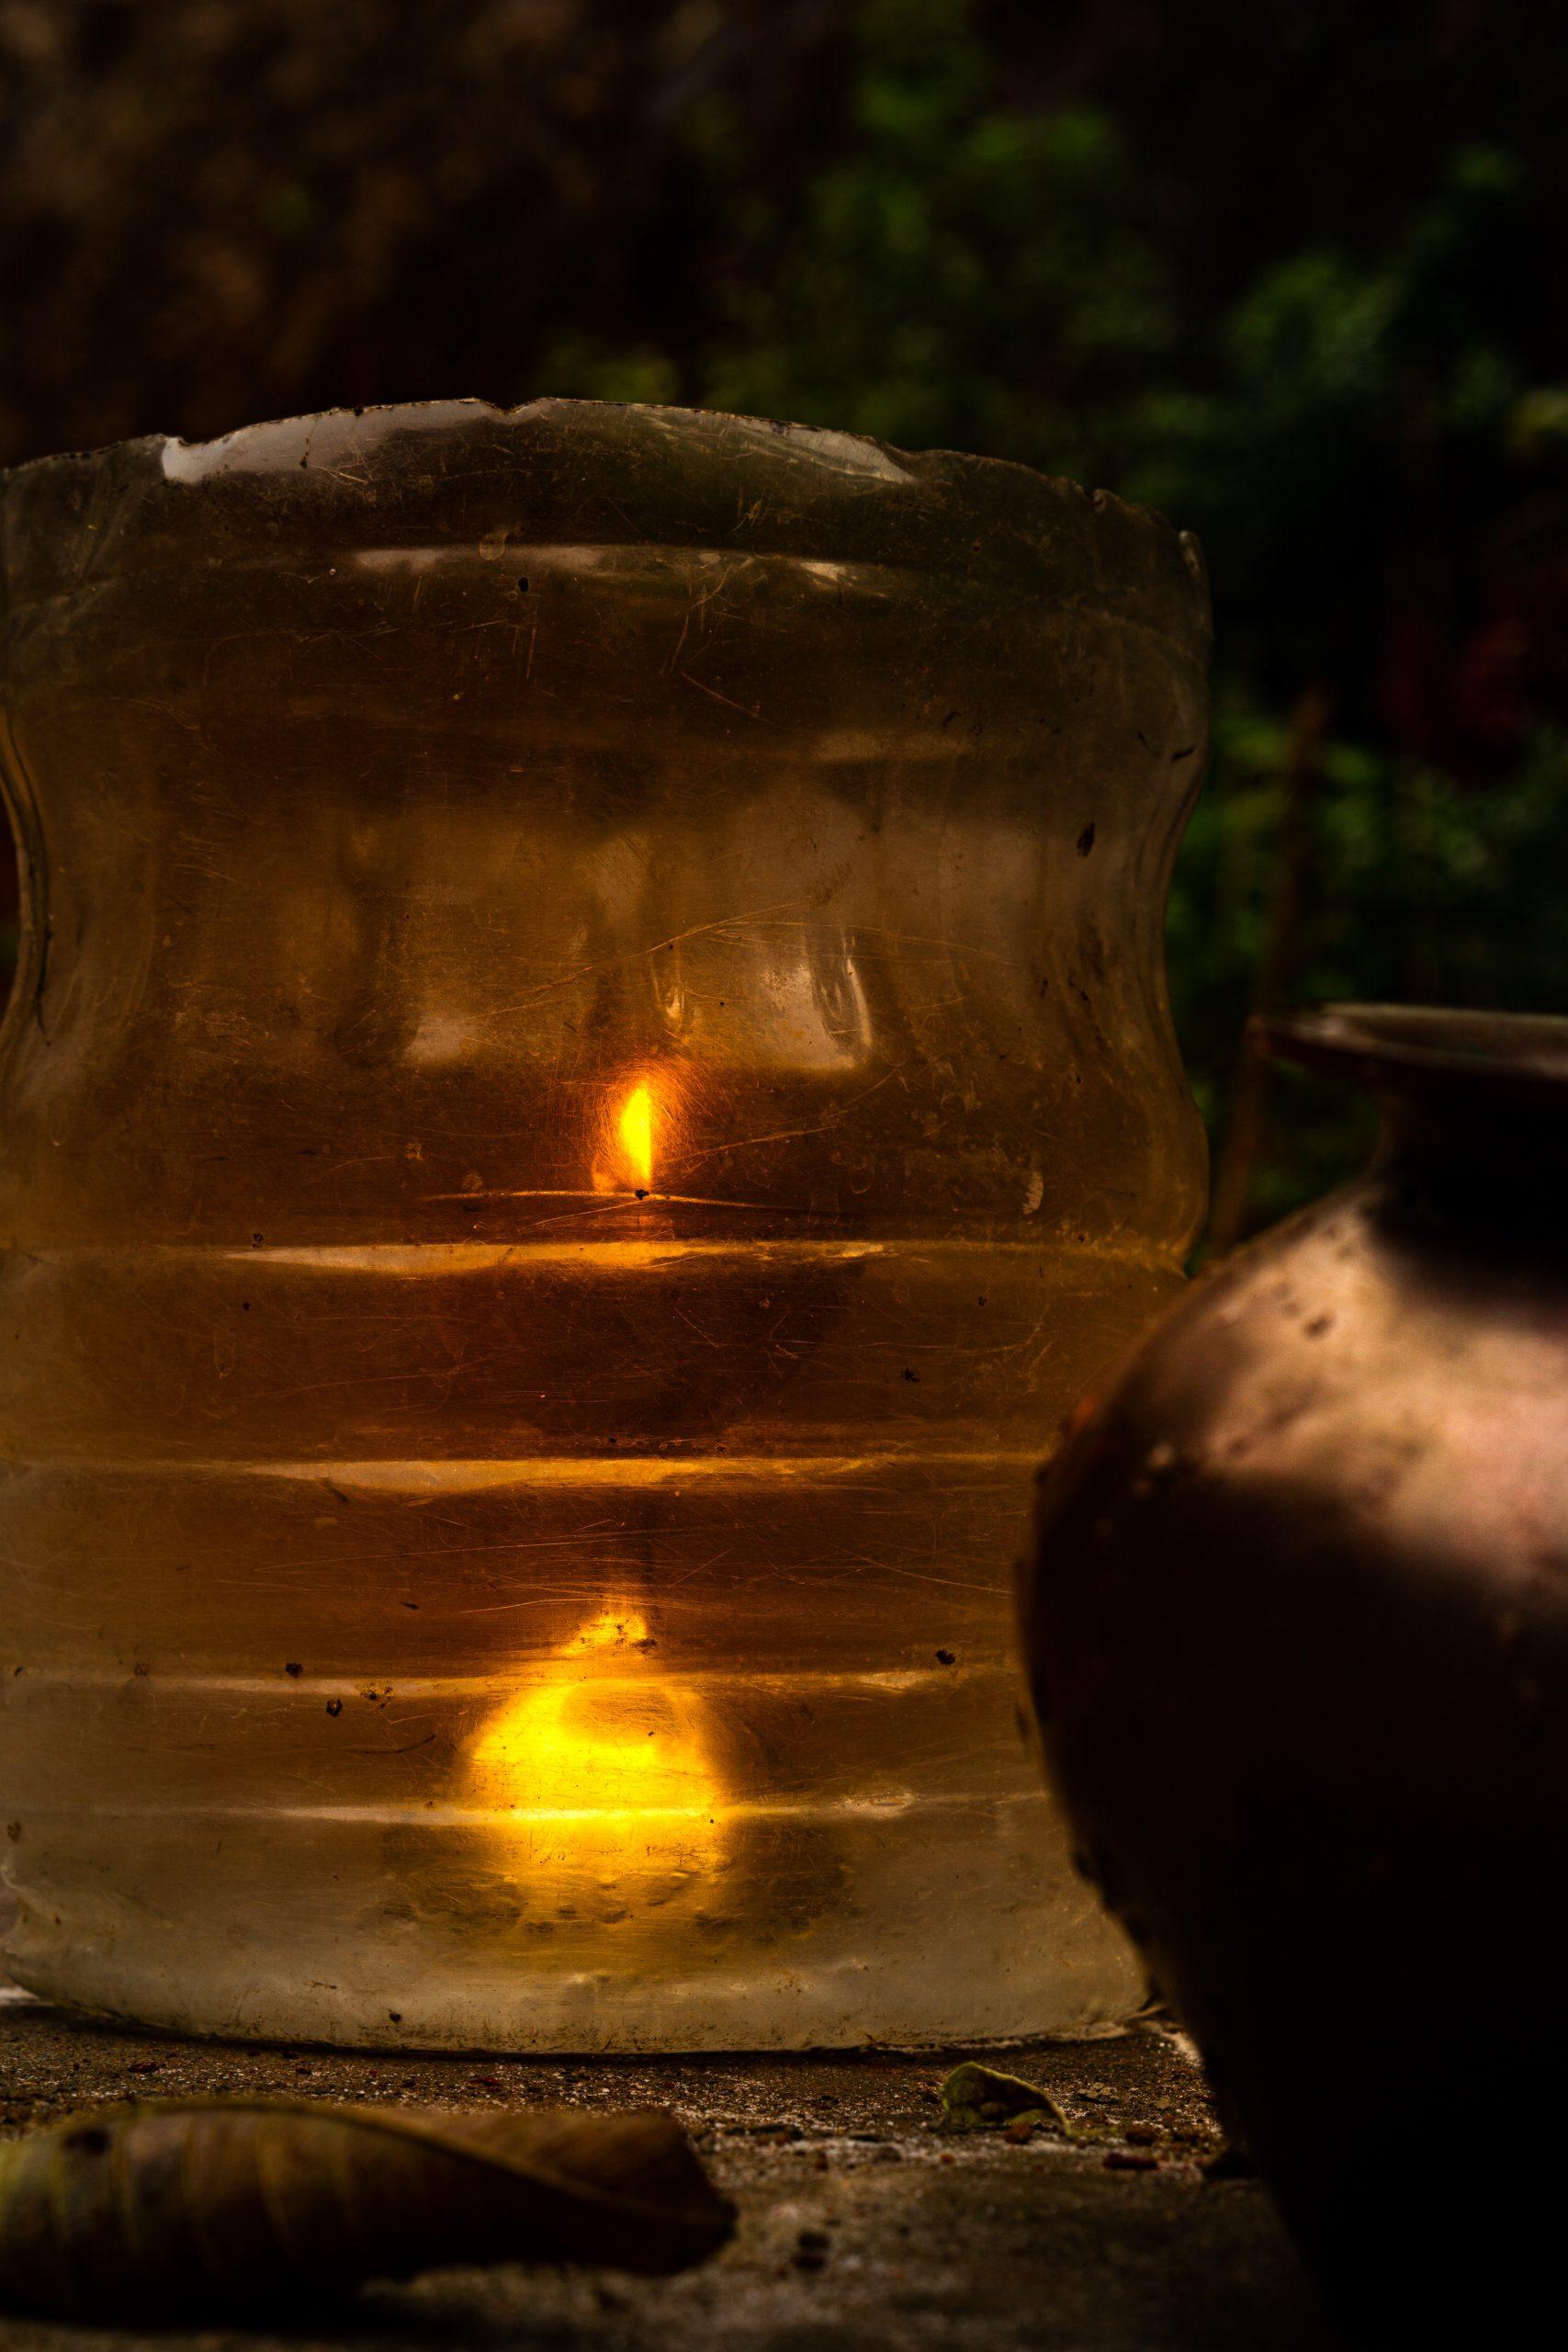 A lamp in a vessel